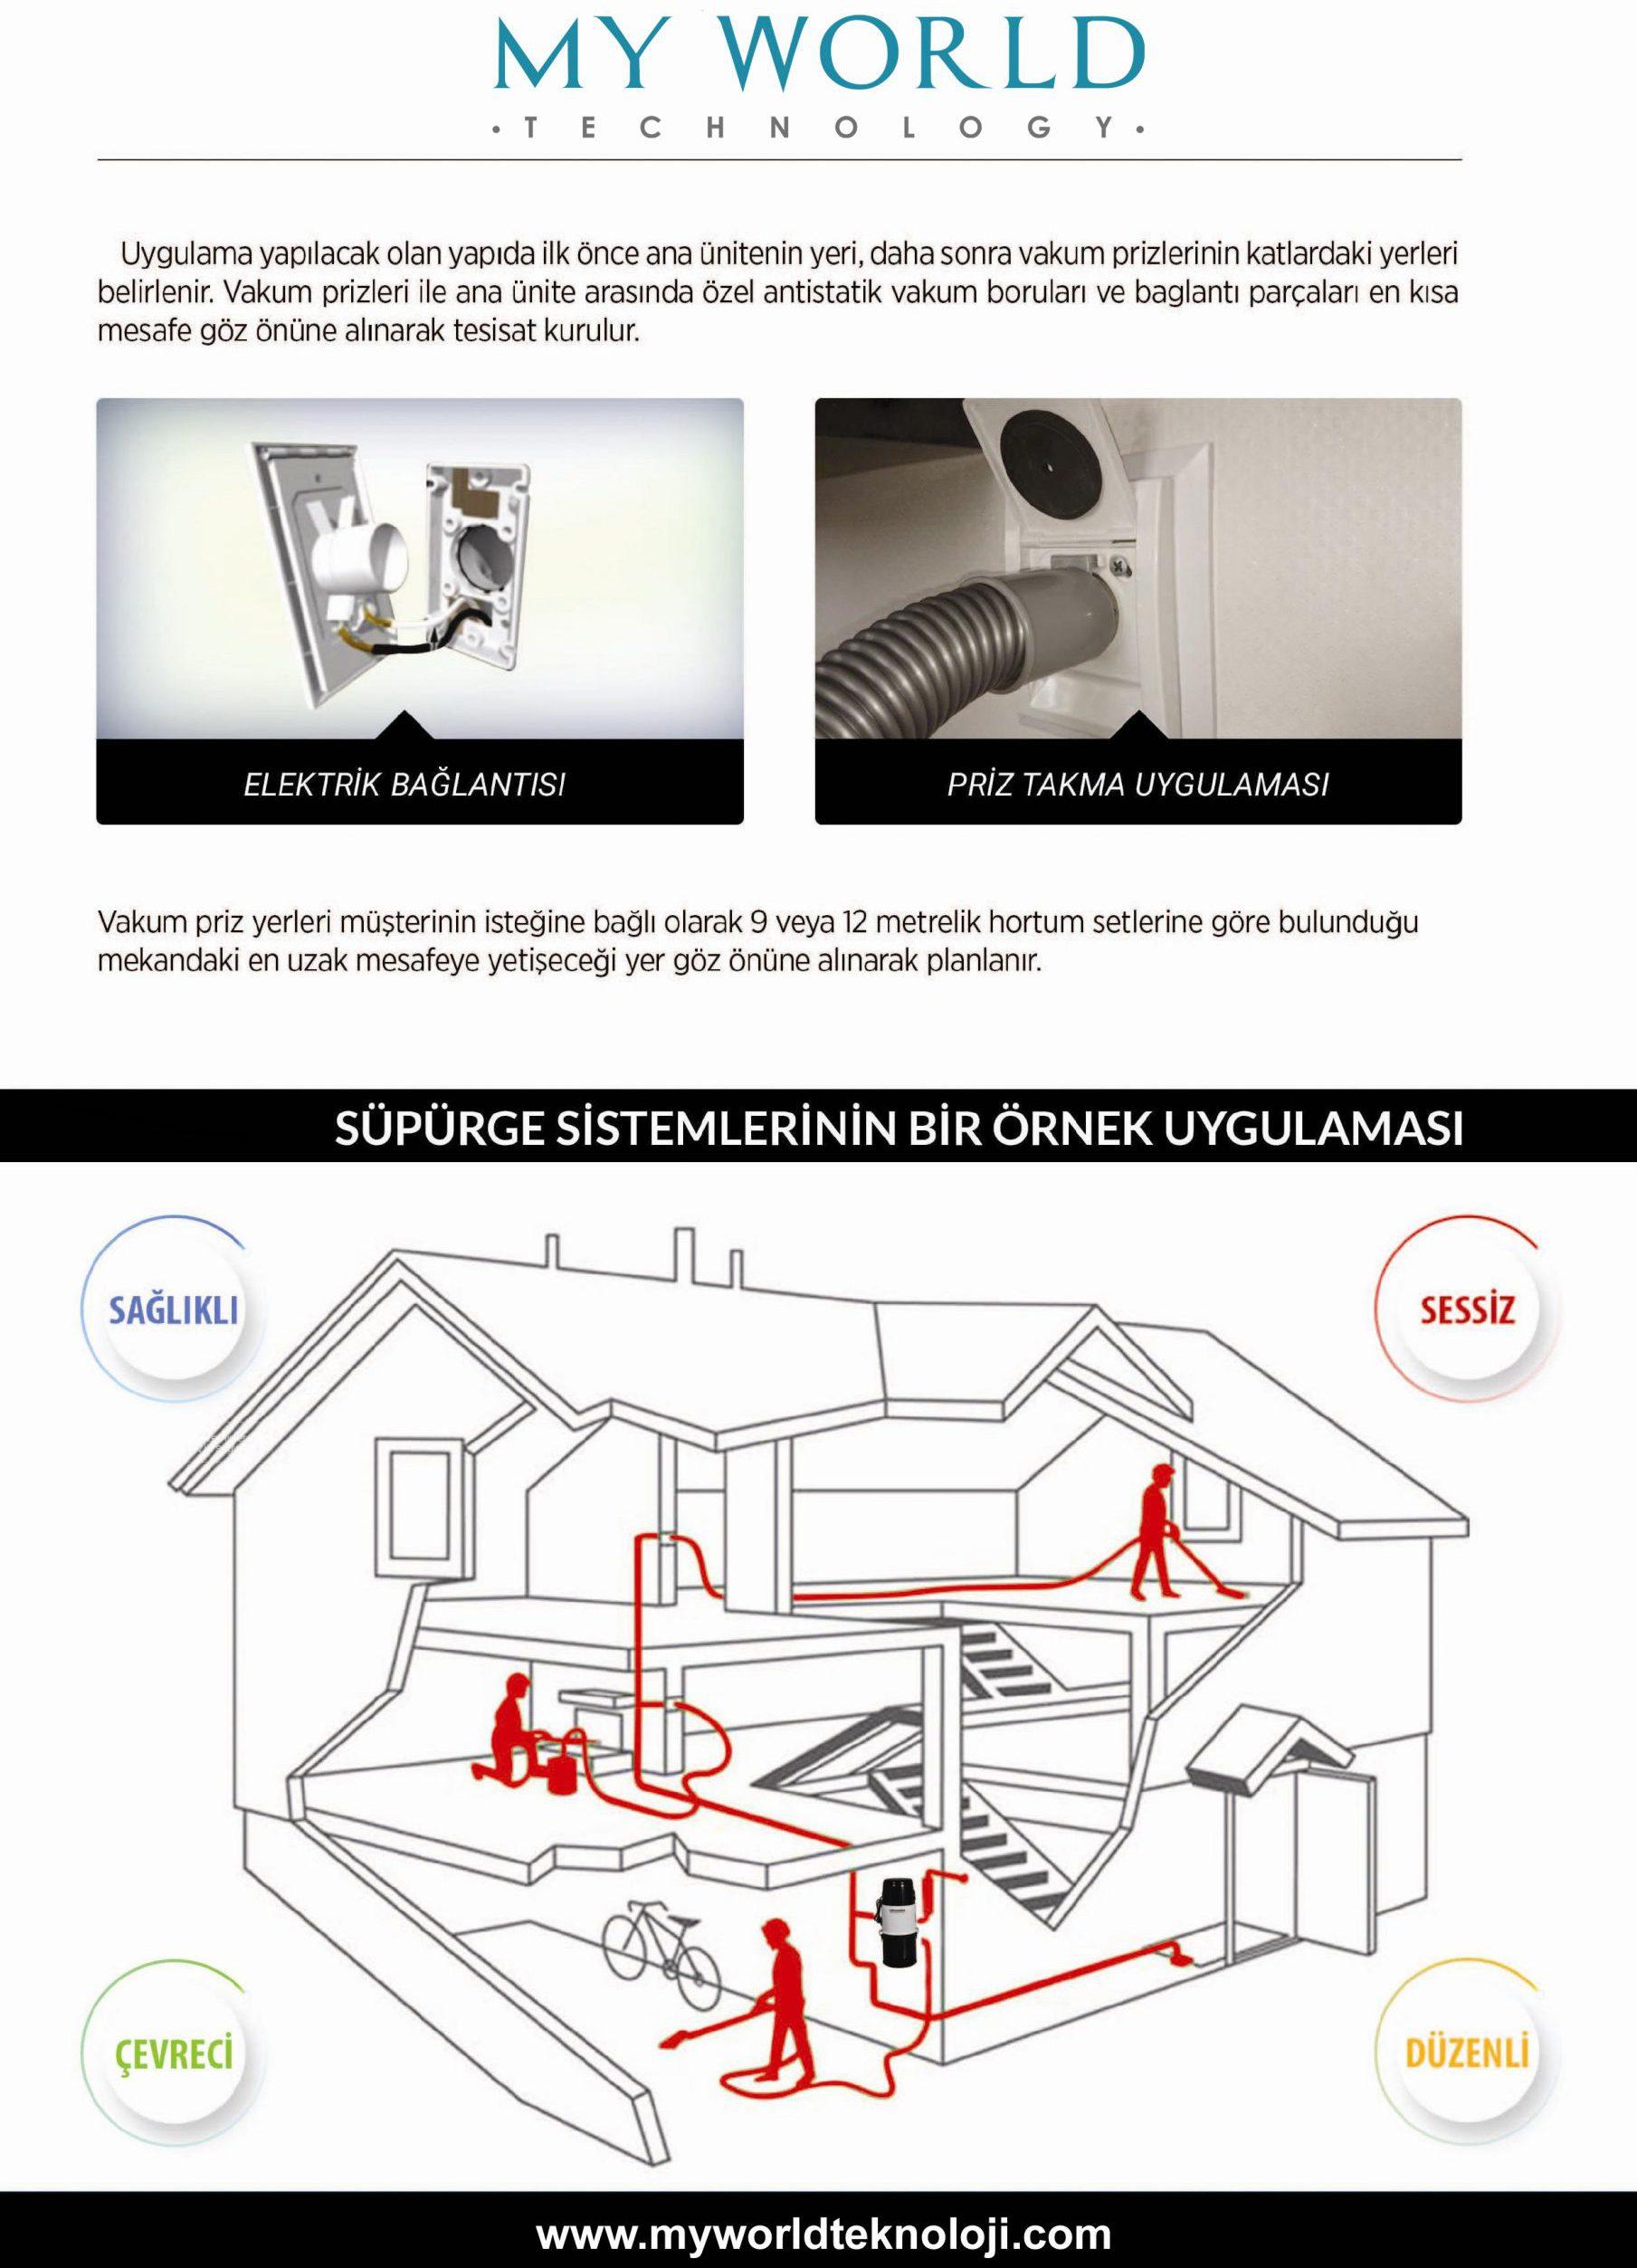 my_world_teknoloji_merkezi_süpürge_sistemi (7)